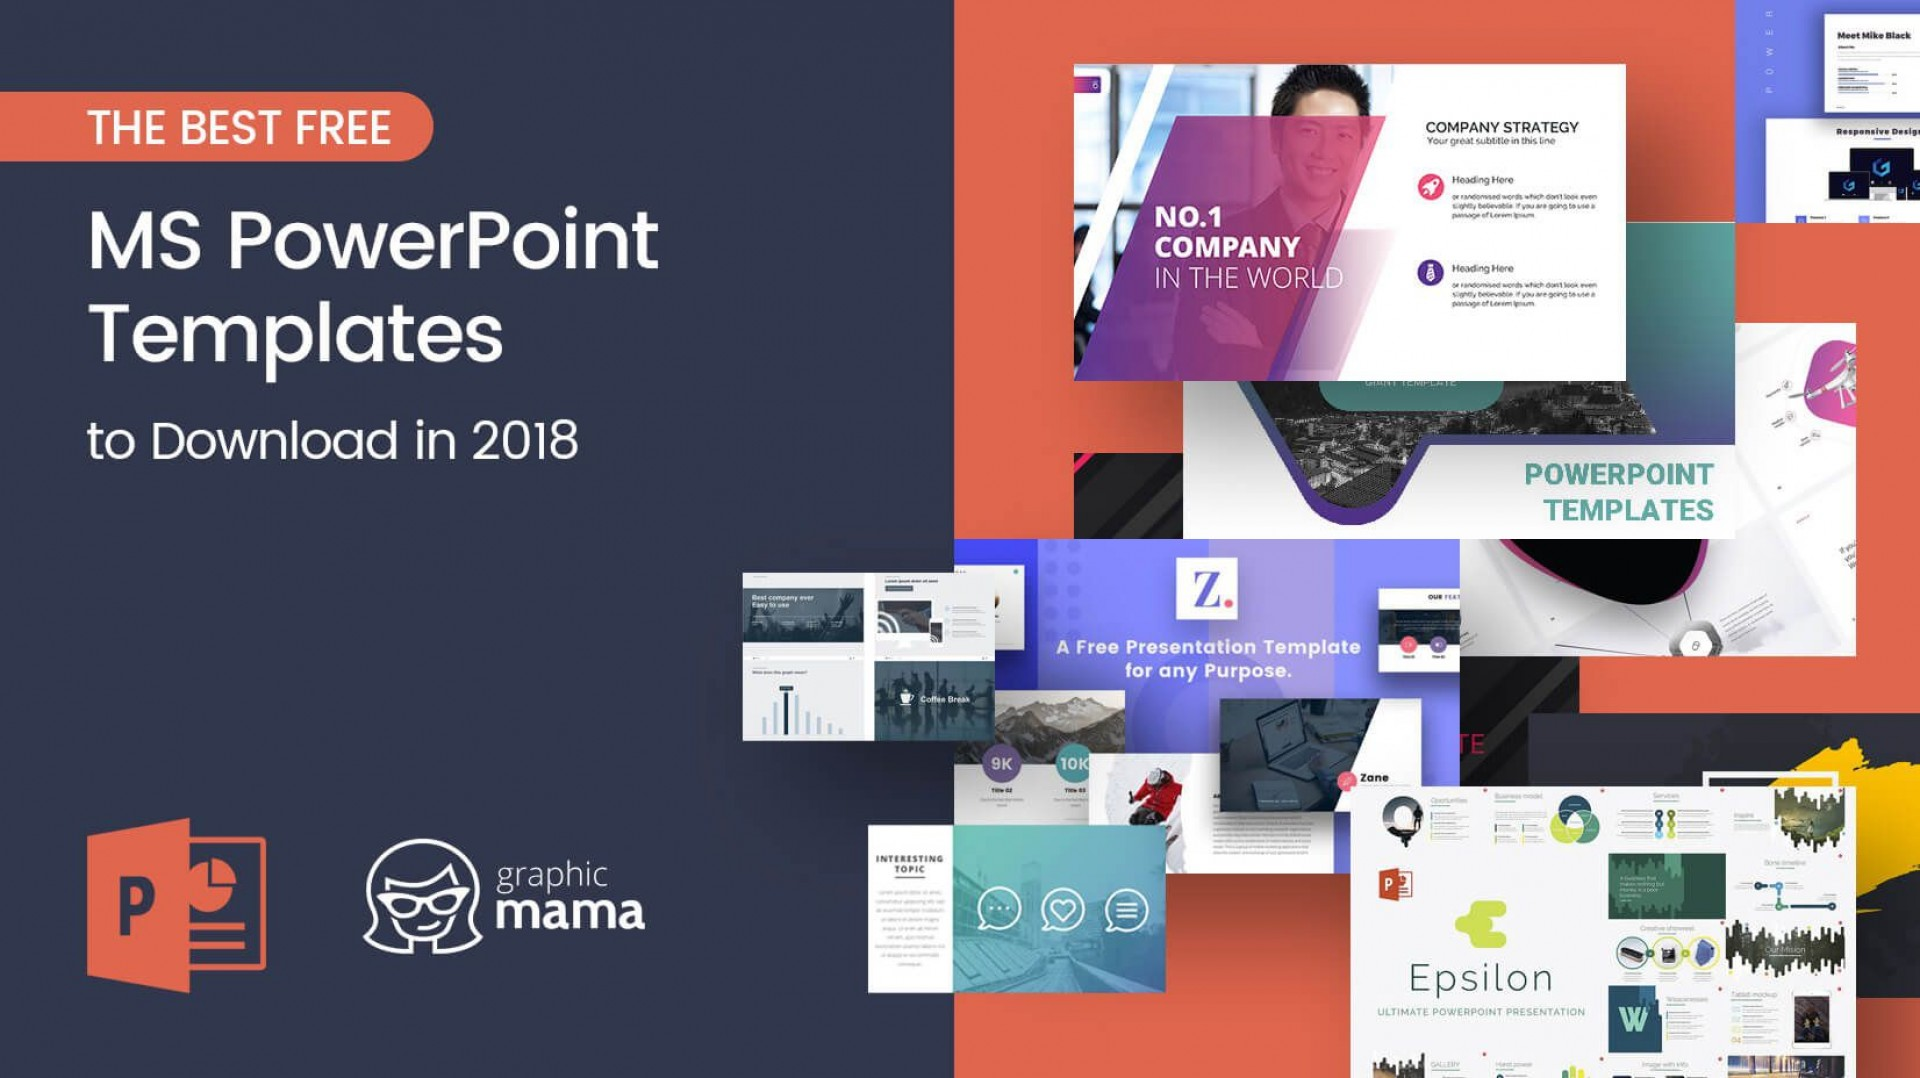 008 Wondrou Ppt Slide Design Template Free Download Inspiration  One Resume Team Introduction Powerpoint Presentation1920